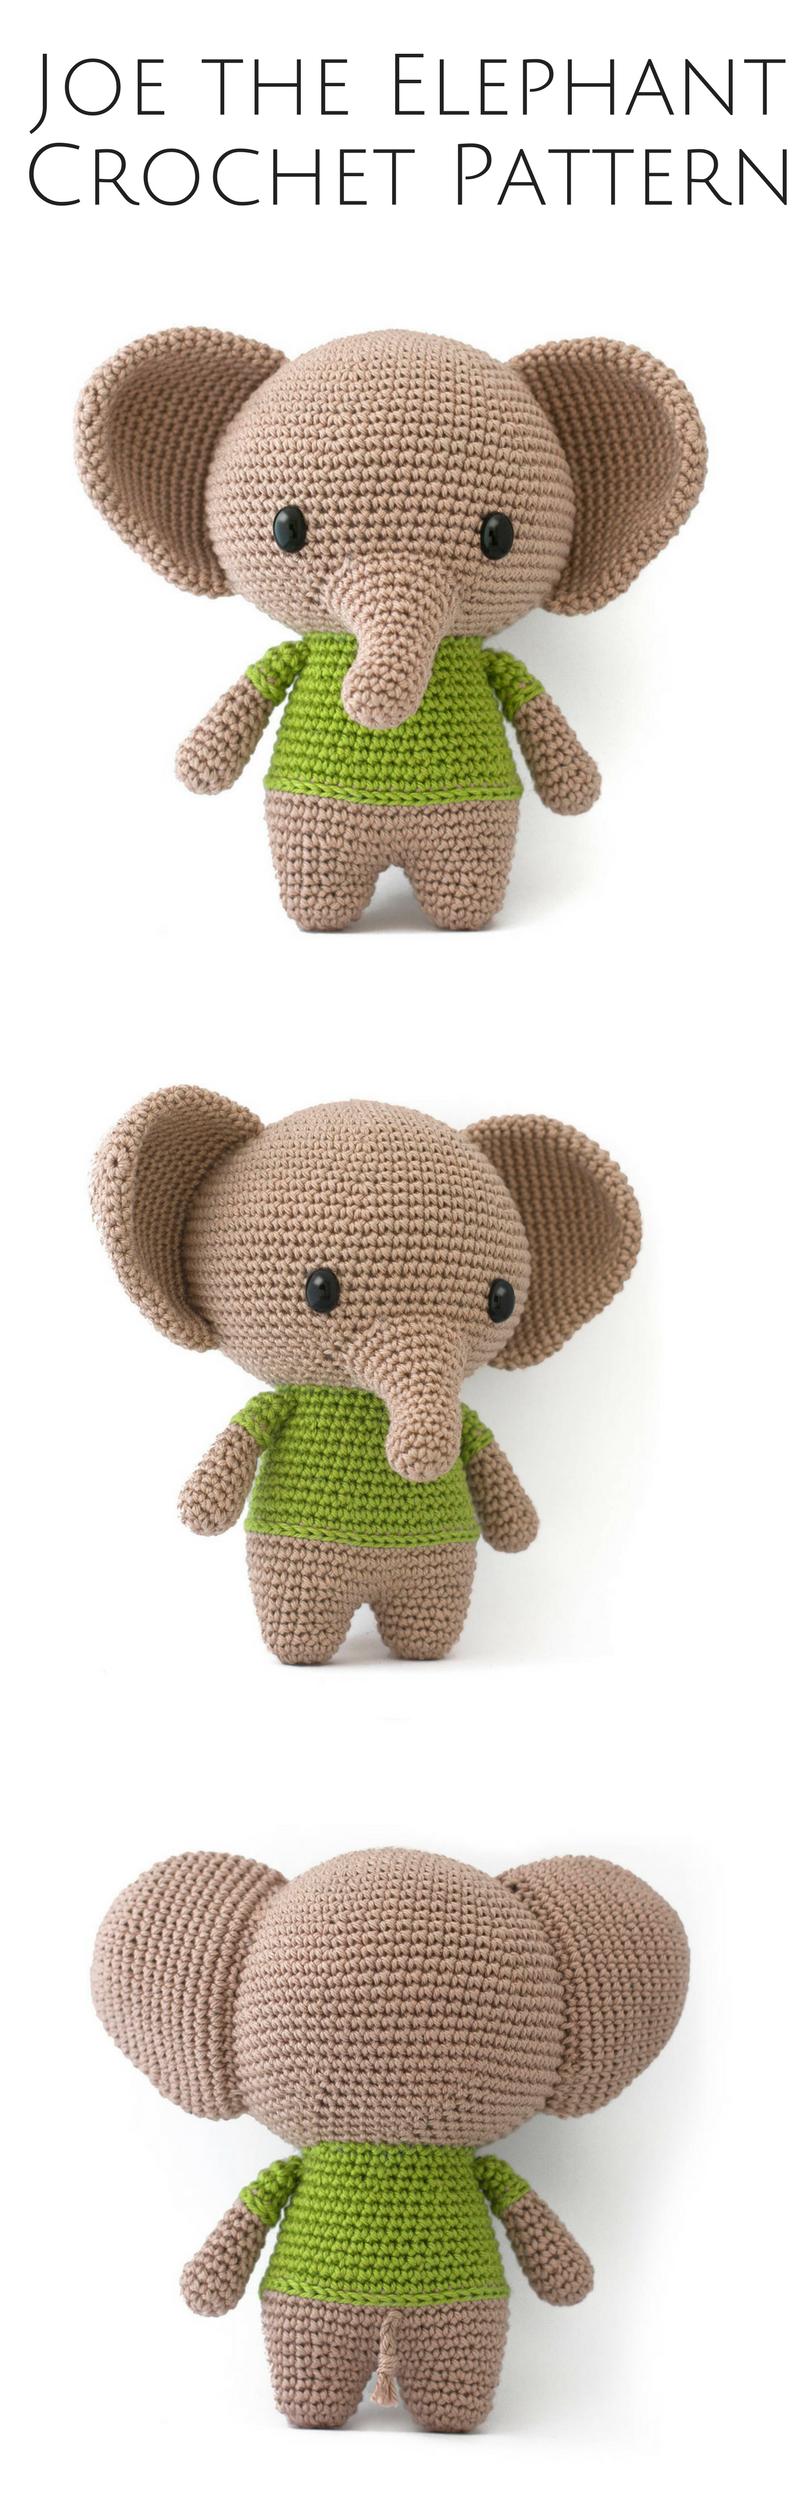 Joe the Elephant amigurumi crochet pattern PDF   Patrones amigurumi ...